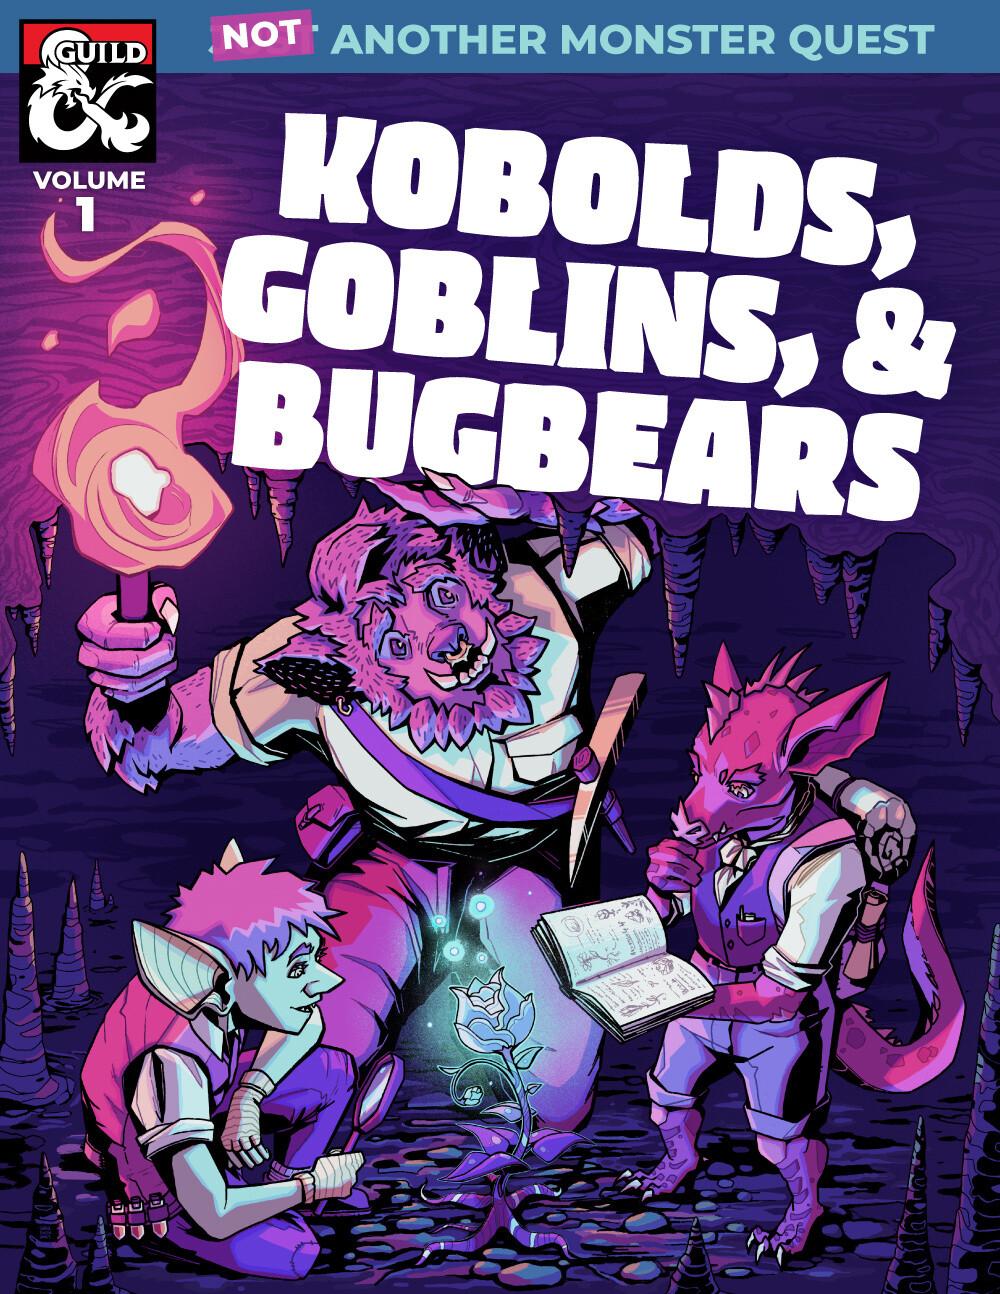 Kobolds, Goblins & Bugbears (NAMQB Vol. 1 Cover)